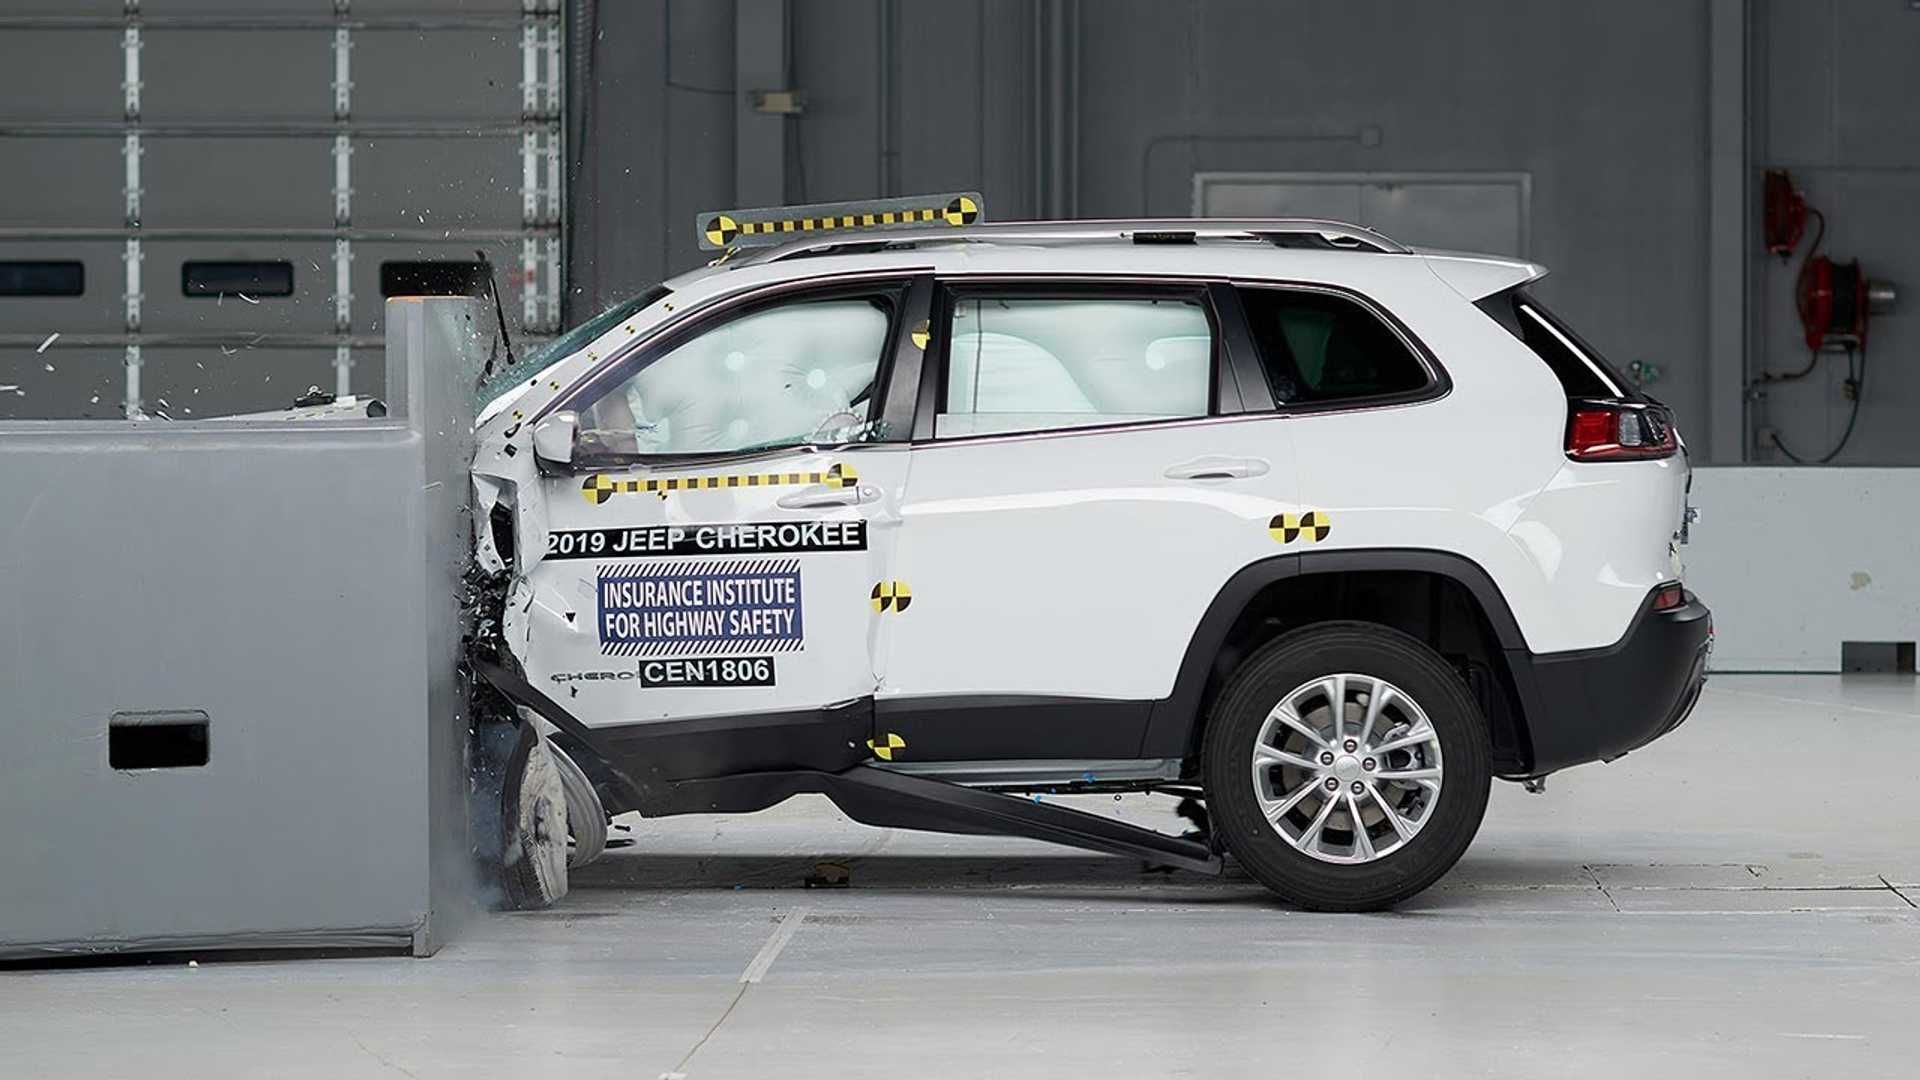 2019 Jeep Cherokee Ranked Among Safest Midsize SUVs